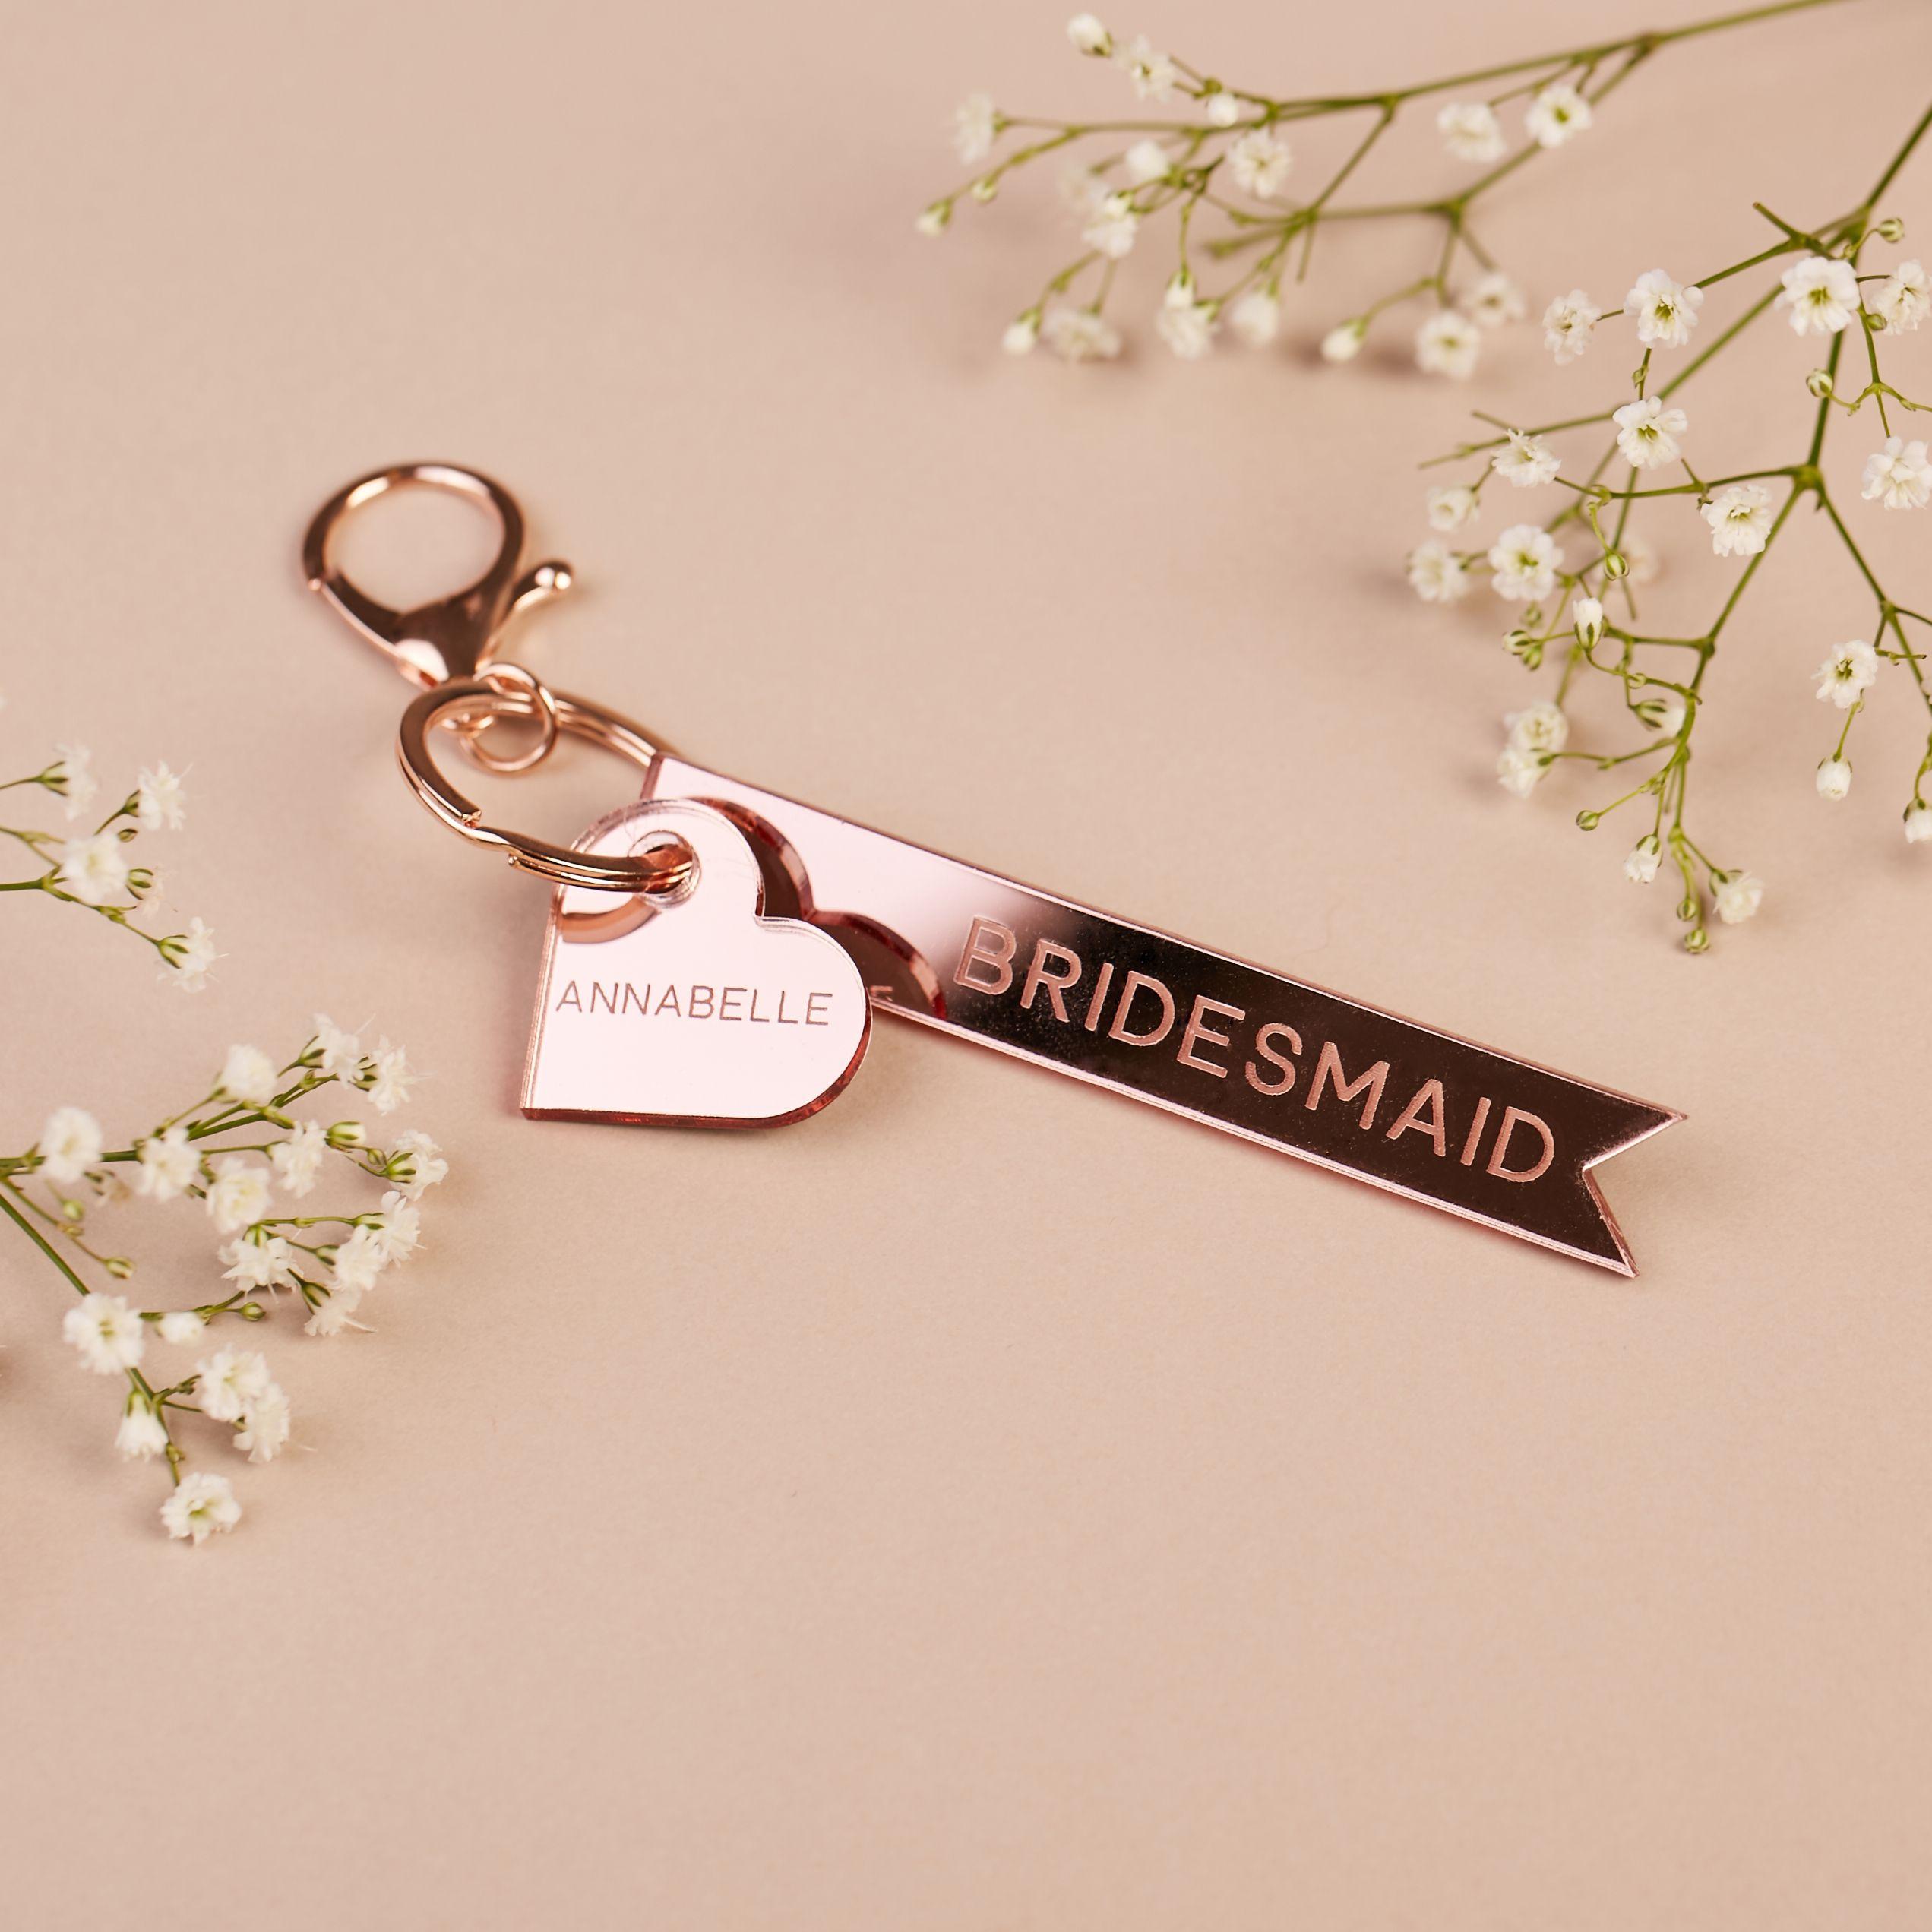 Bridesmaid Personalised Keyring in 2021 | Bridesmaids personalized,  Bridesmaid proposal gifts, Bridesmaid proposal